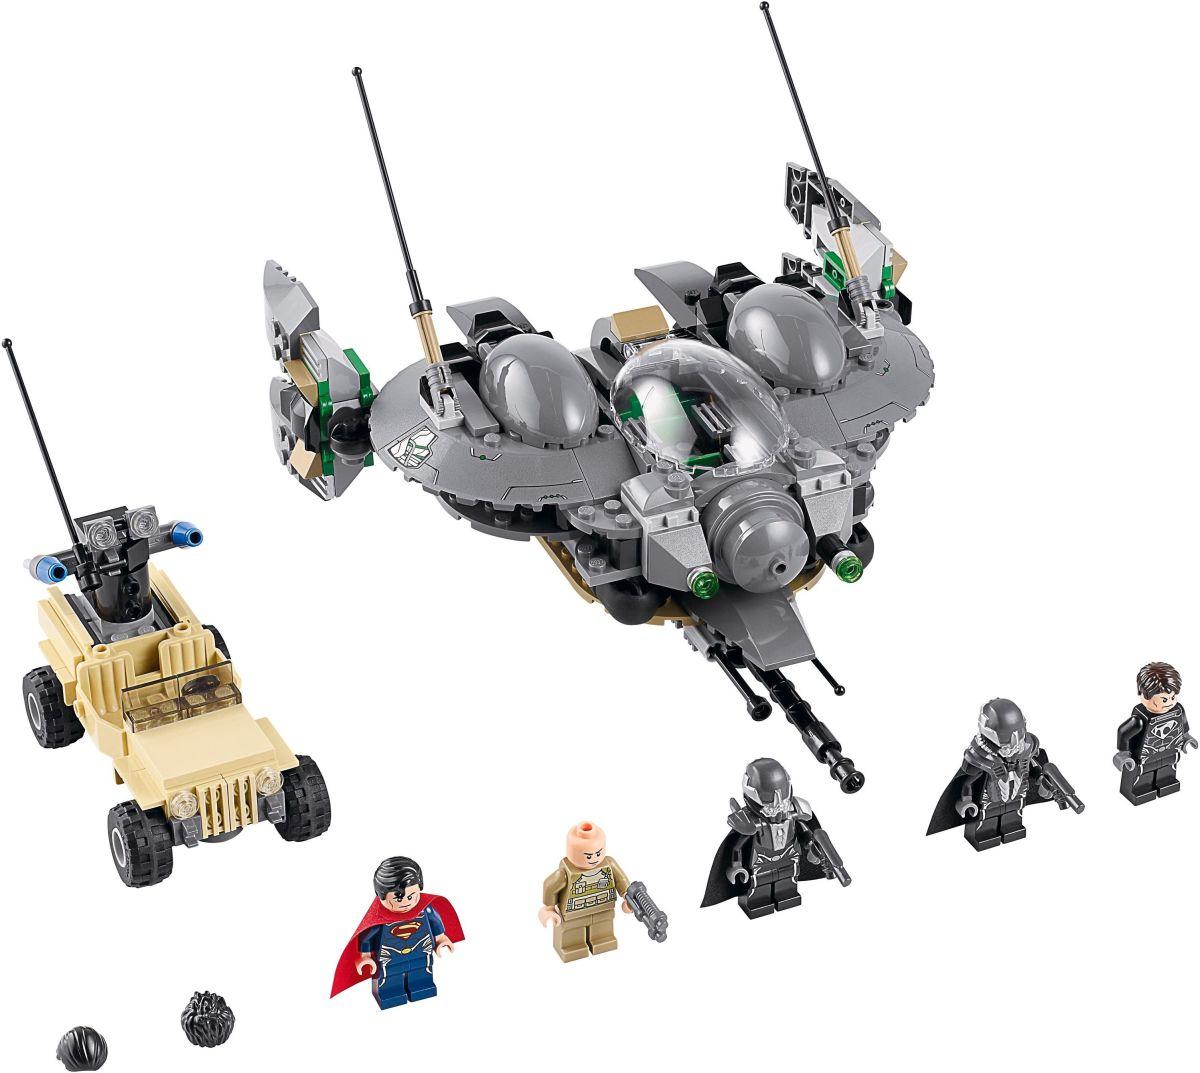 LEGO Super Heroes Superman Battle of Smallville 76003 Assembled